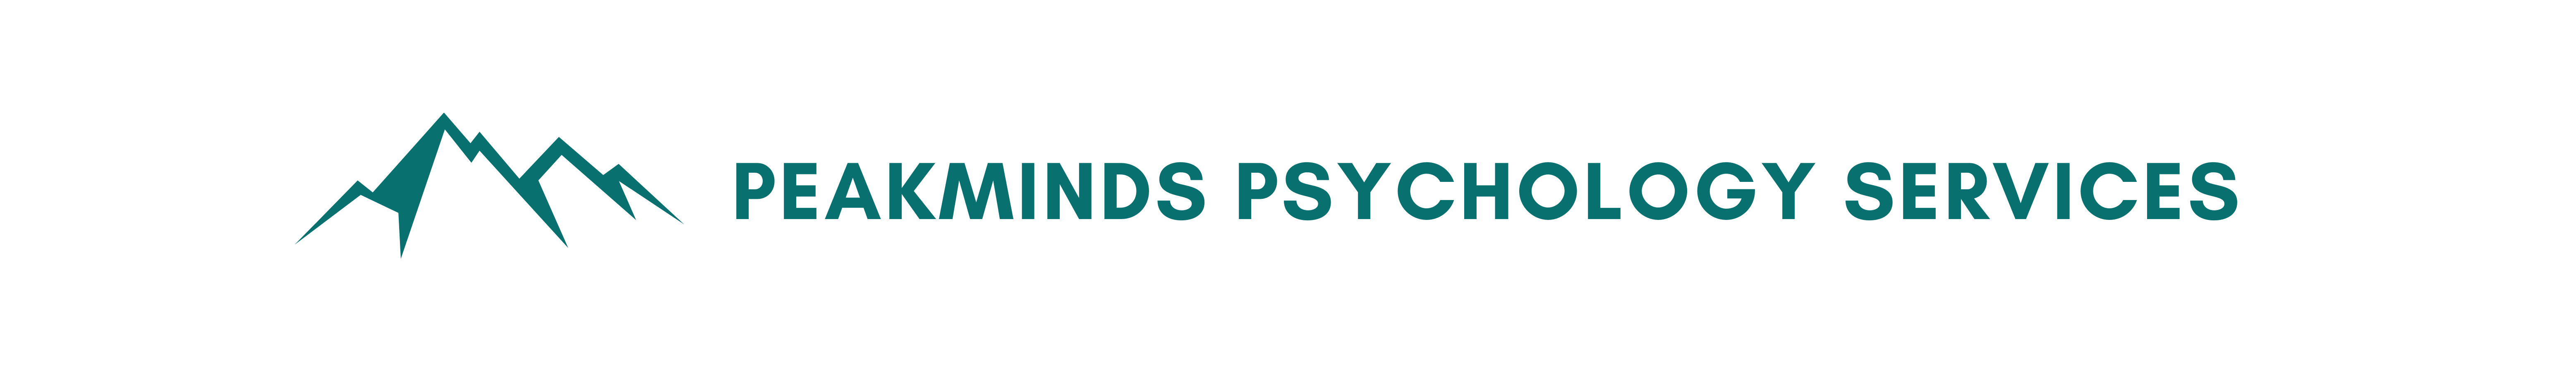 Peakminds Psychology Services